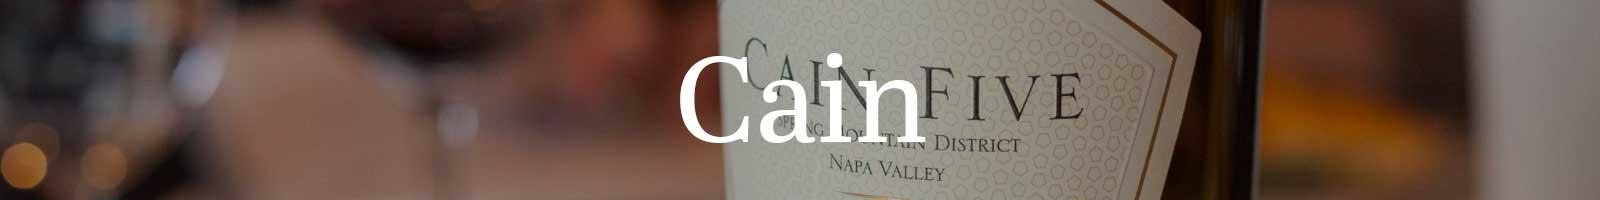 Essential Winemakers of California - Cain